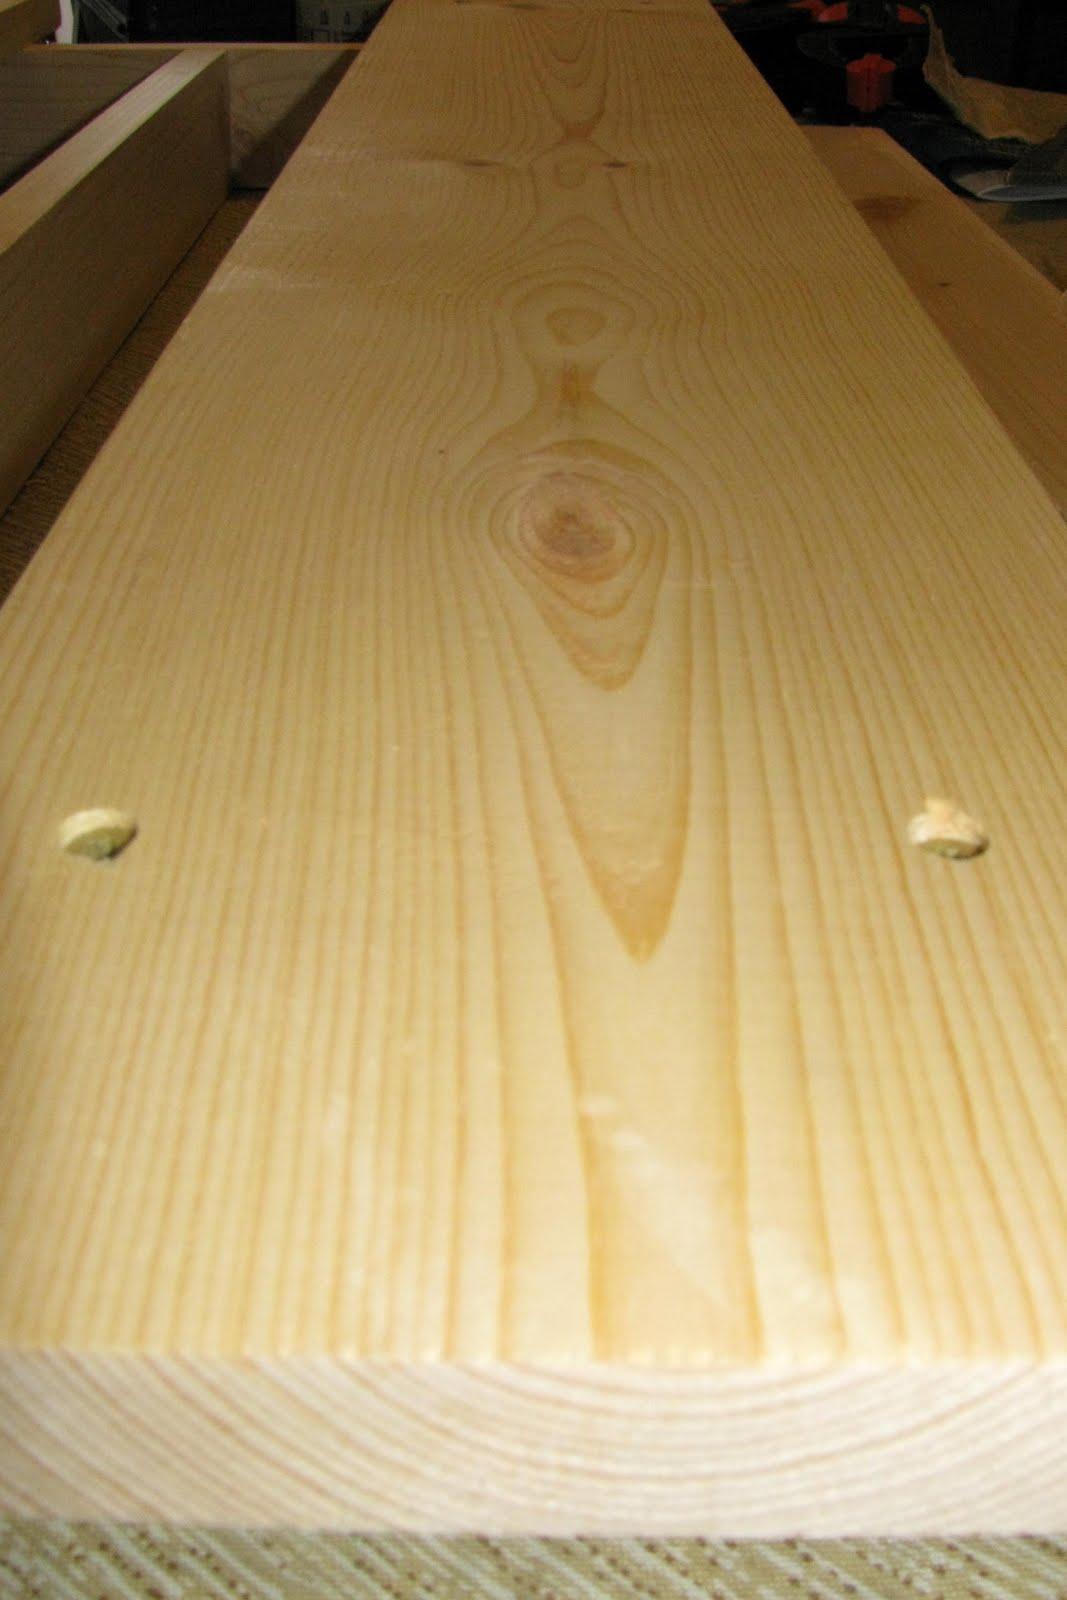 Finish Yourself Wood Flourescent Kitchen Light